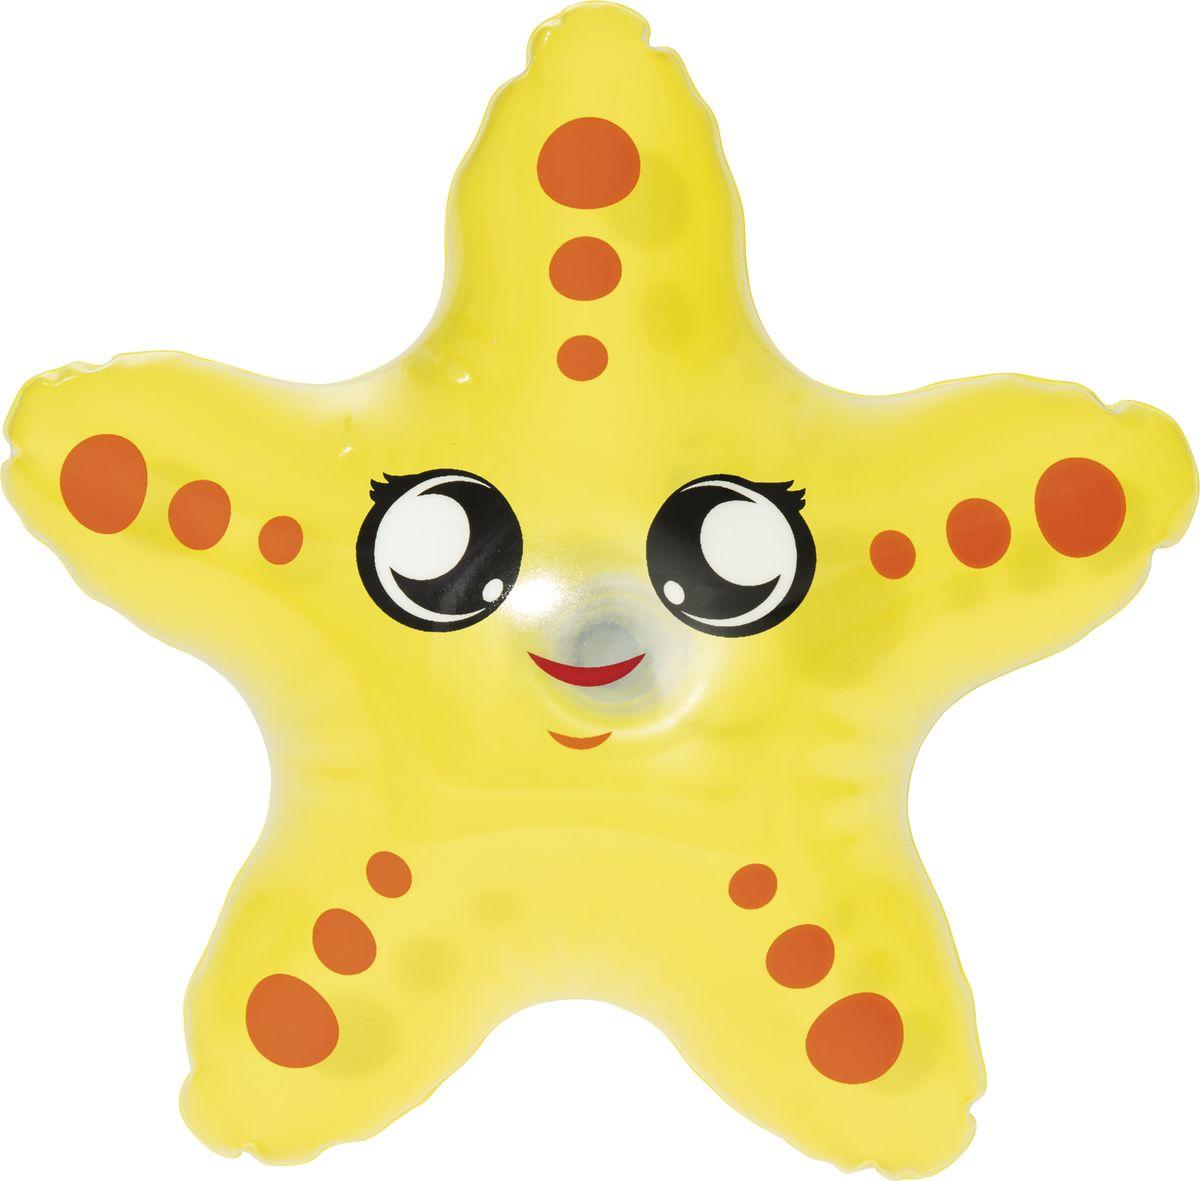 Bestway Игрушка надувная Bestway Животное Морская звезда